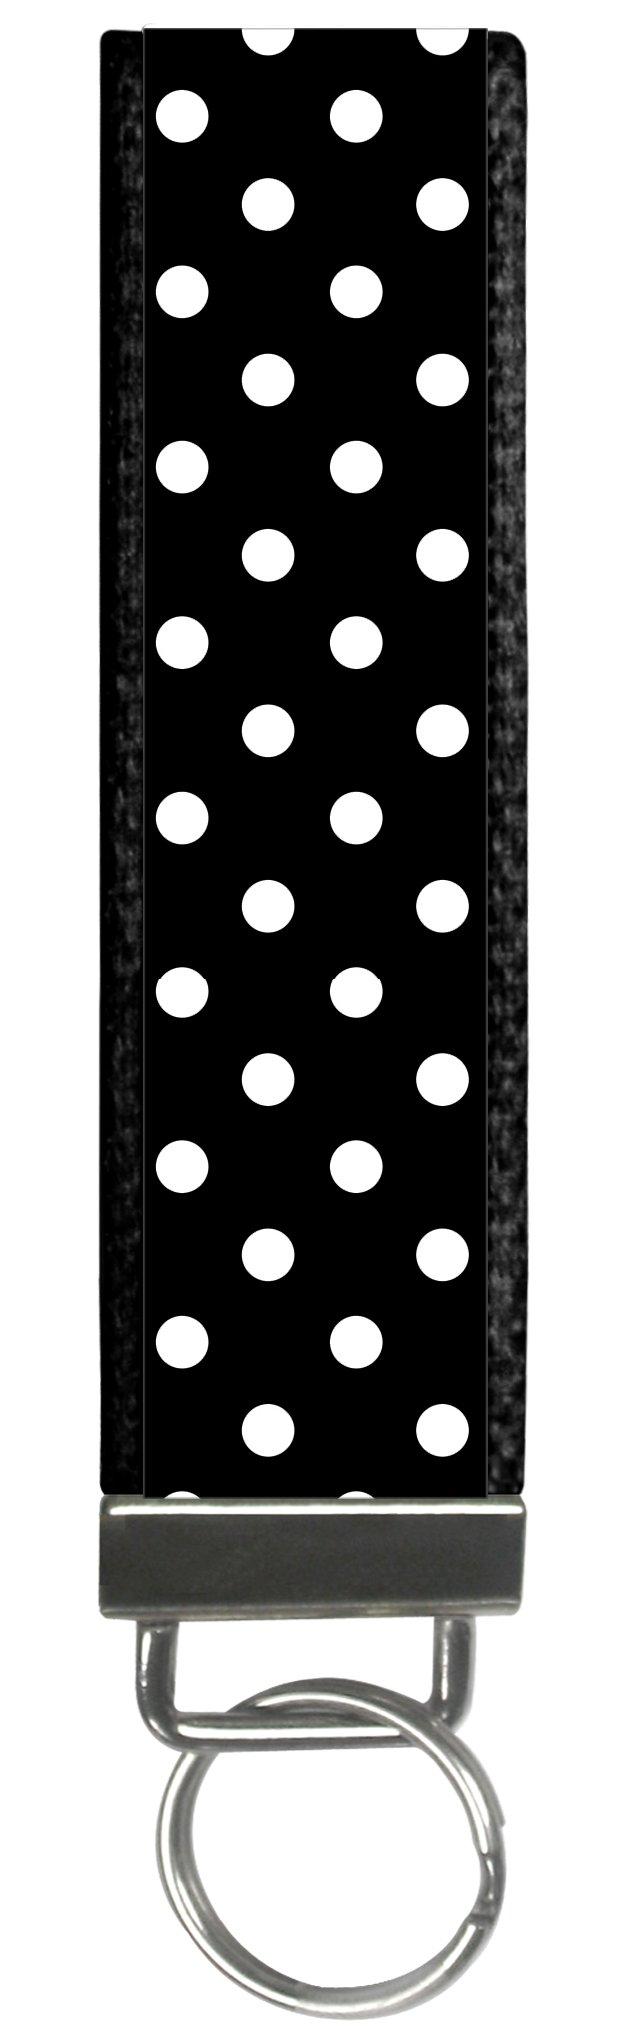 Trendy Polka Dot Tiny Dots Design Black Design Wristlet Keyfob Keychain One Size